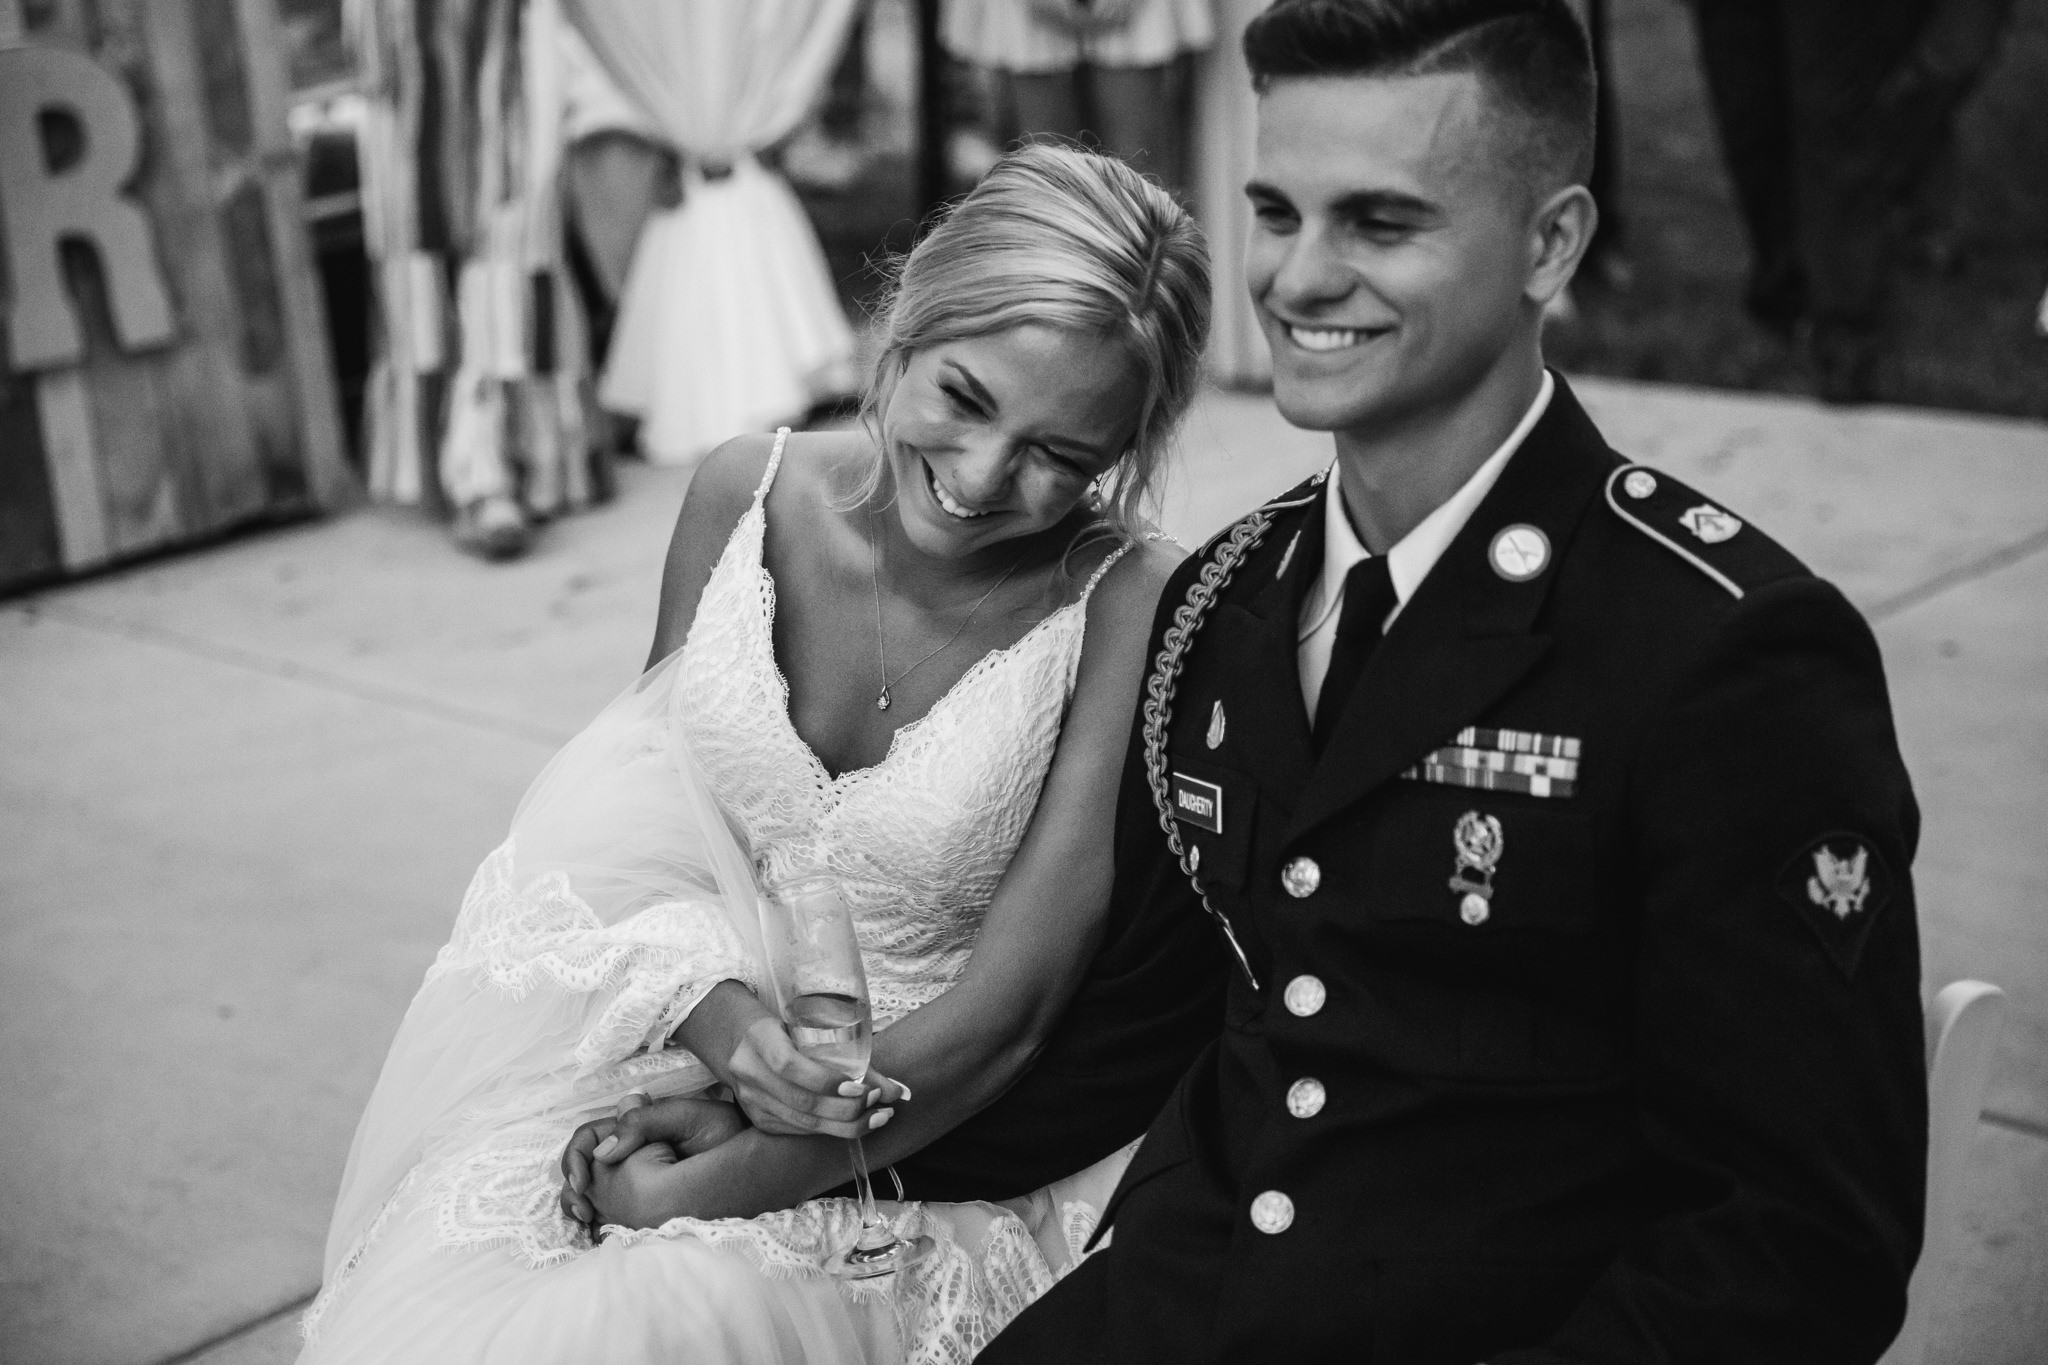 backyard-wedding-thewarmtharoundyou-lexy-branson-38.jpg